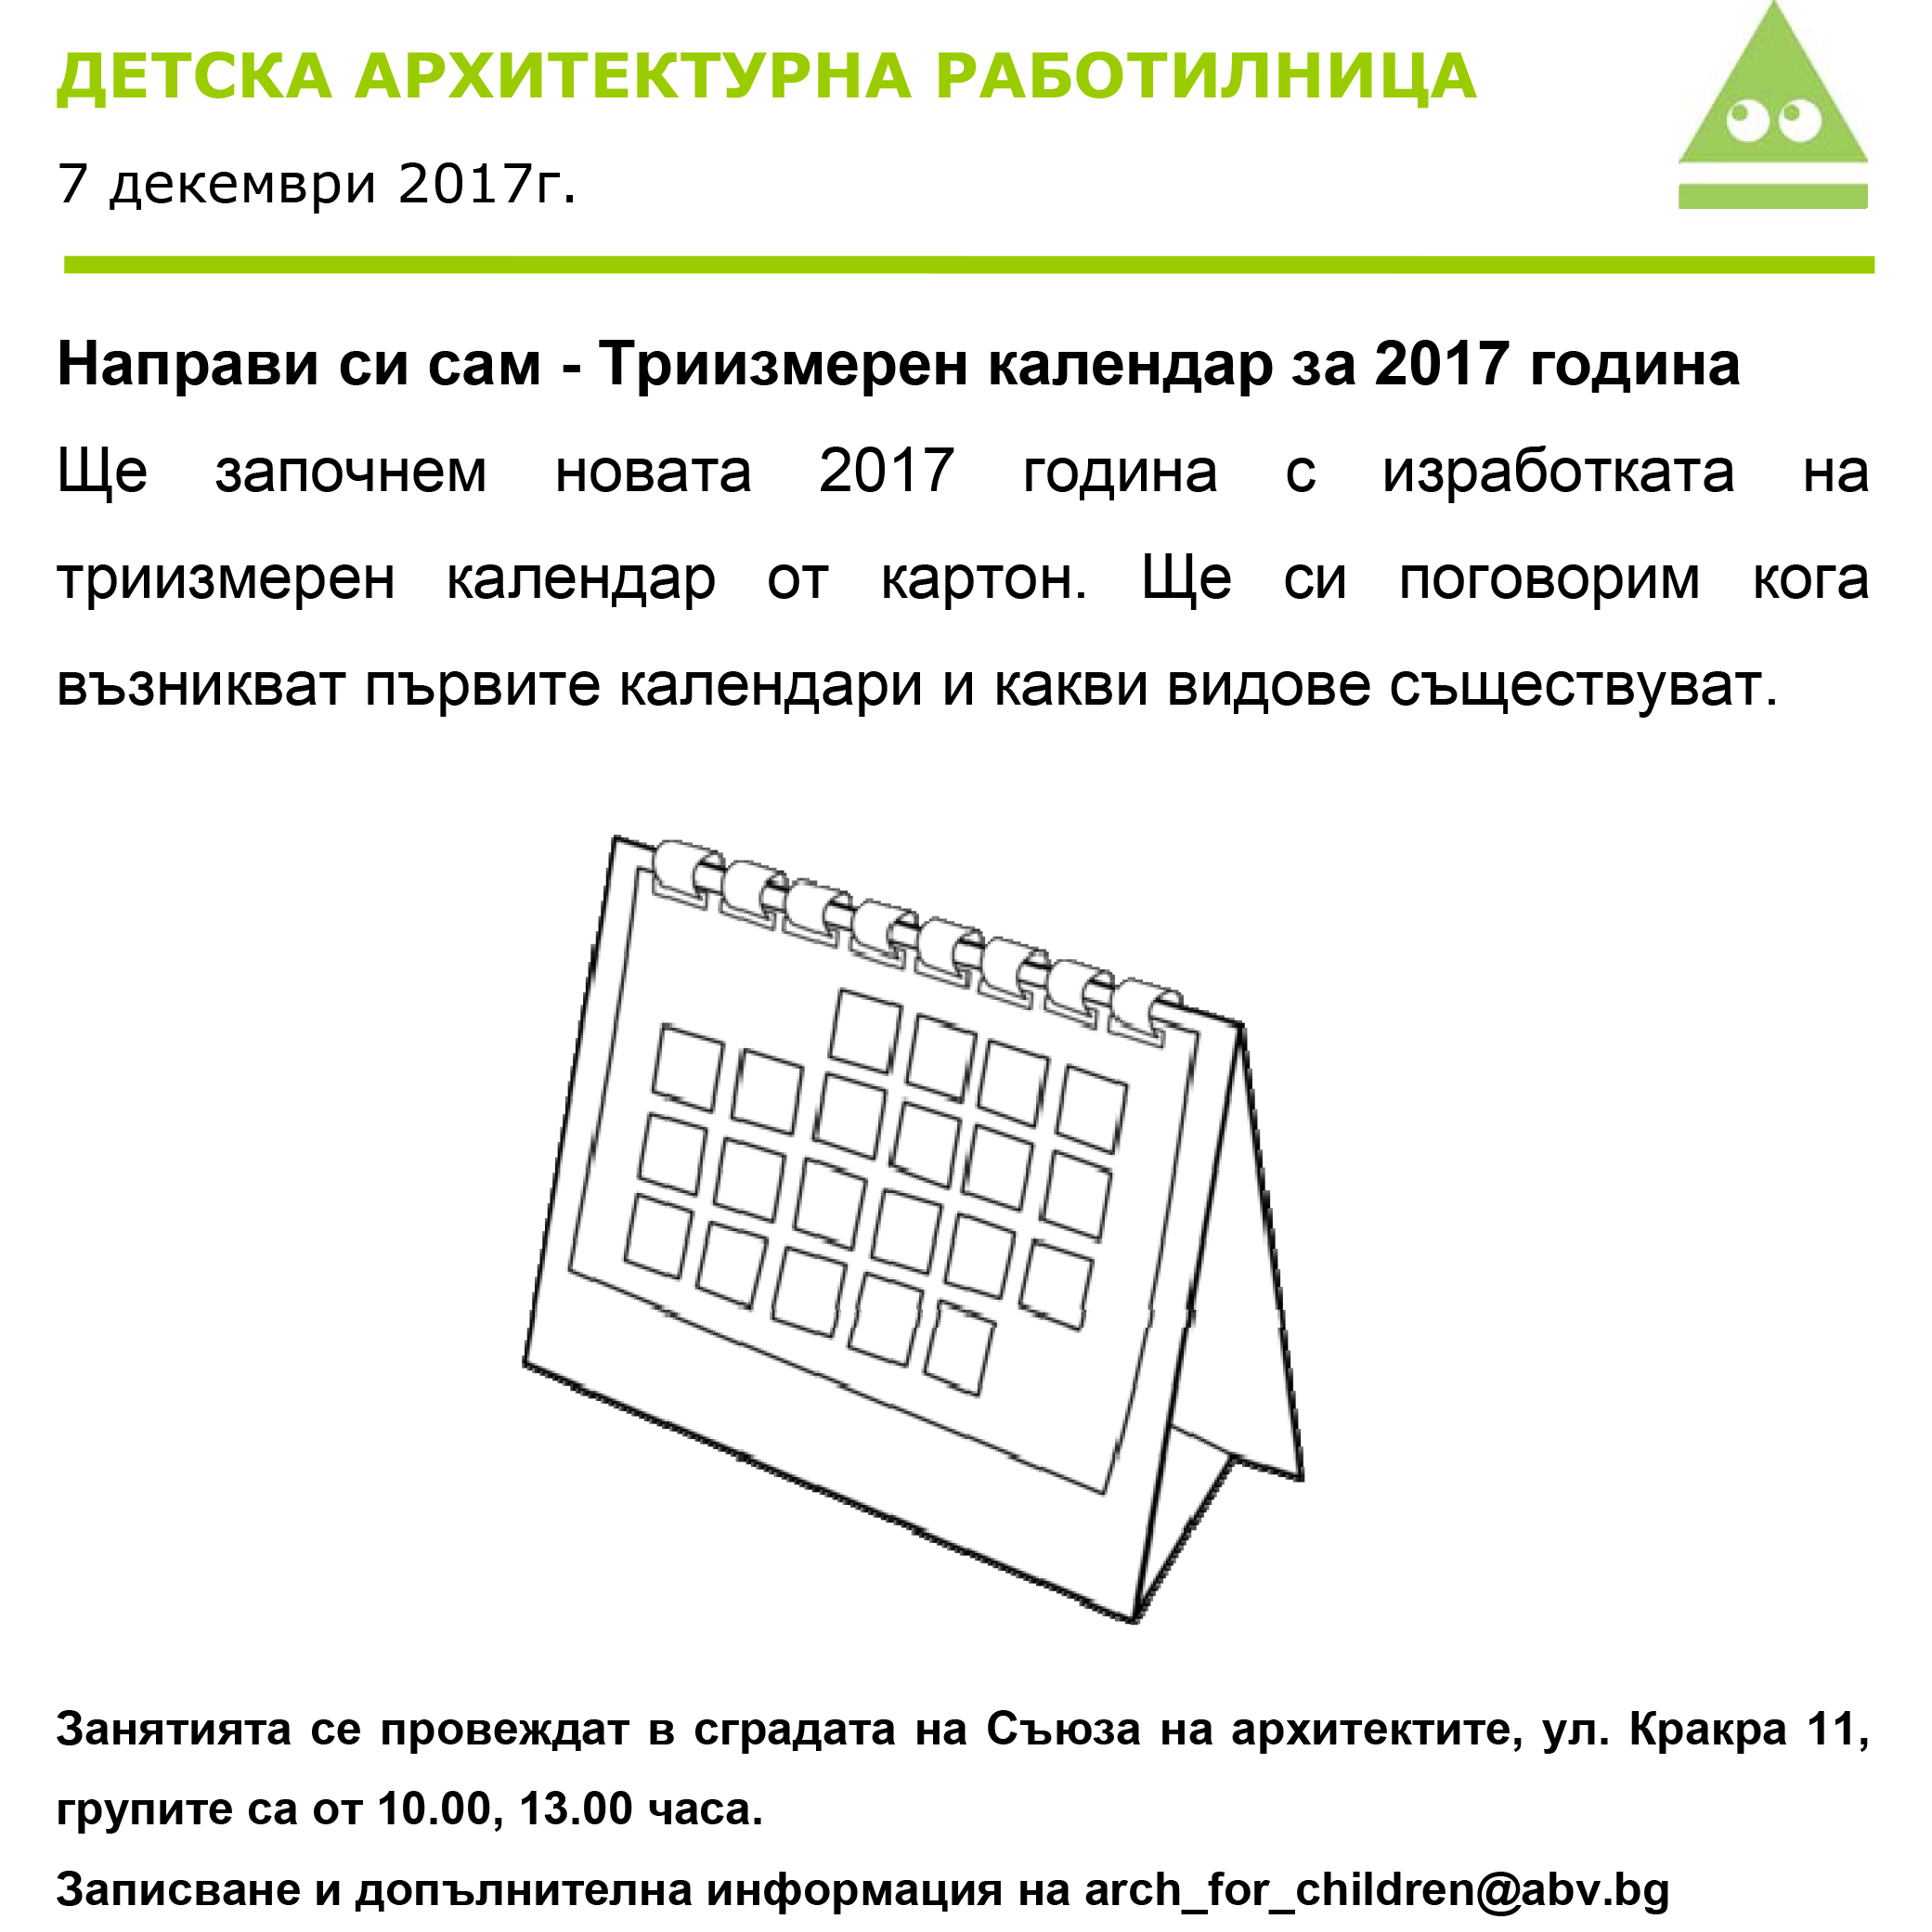 7 януари 2016г - Триизмерен календар за 2017 година